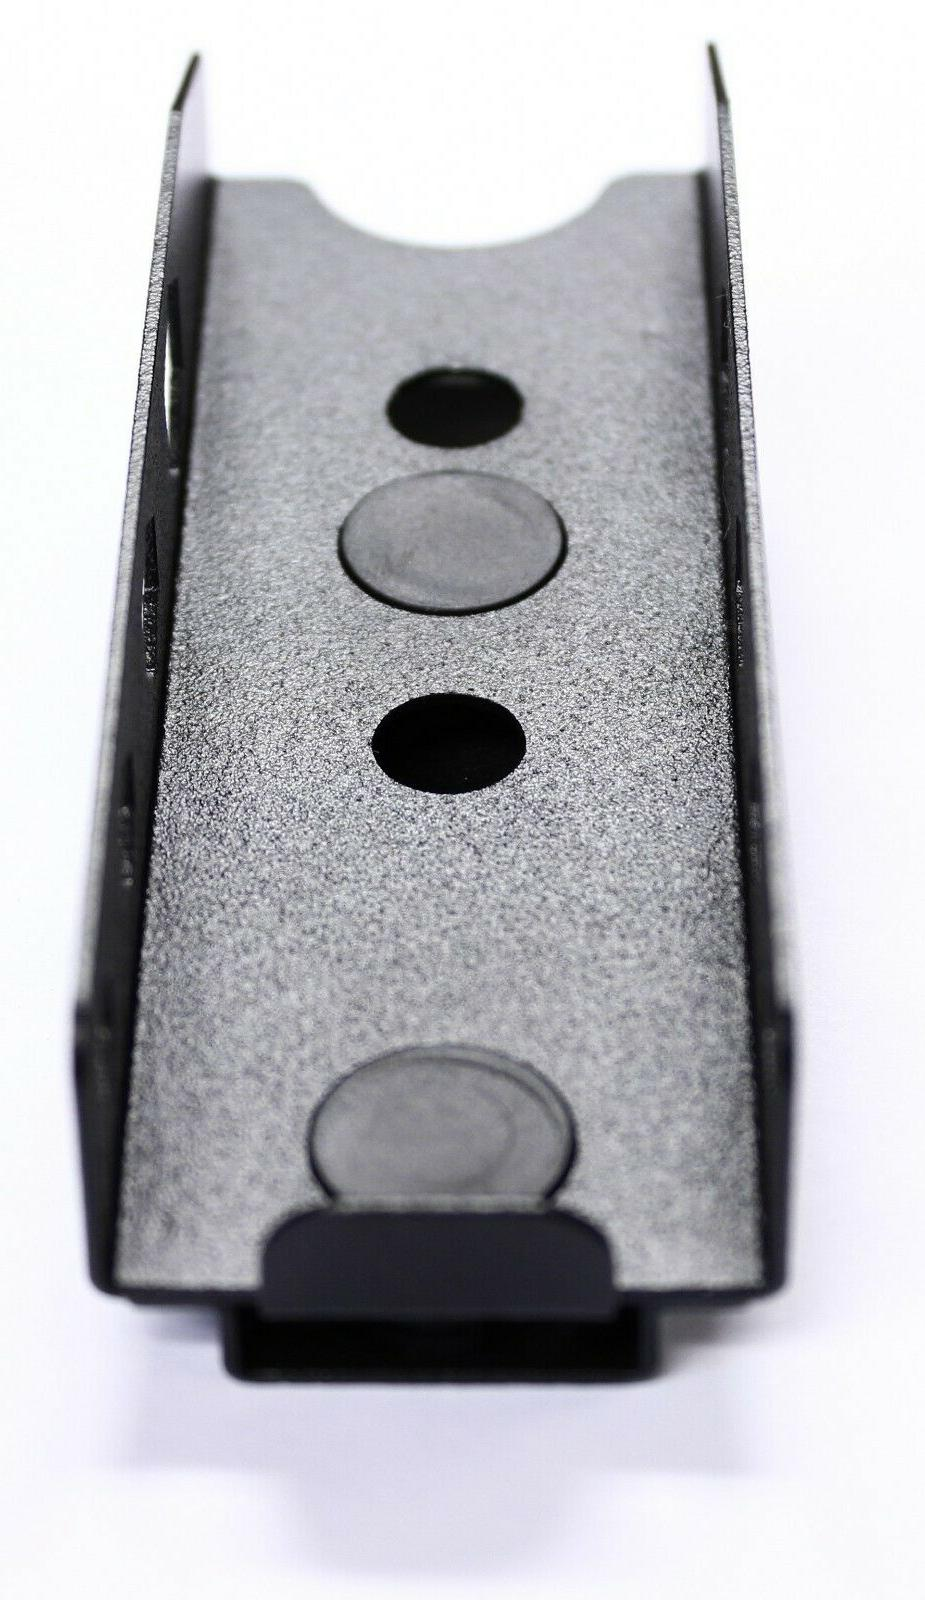 SUPERTOOL Magnetic compatible leatherman